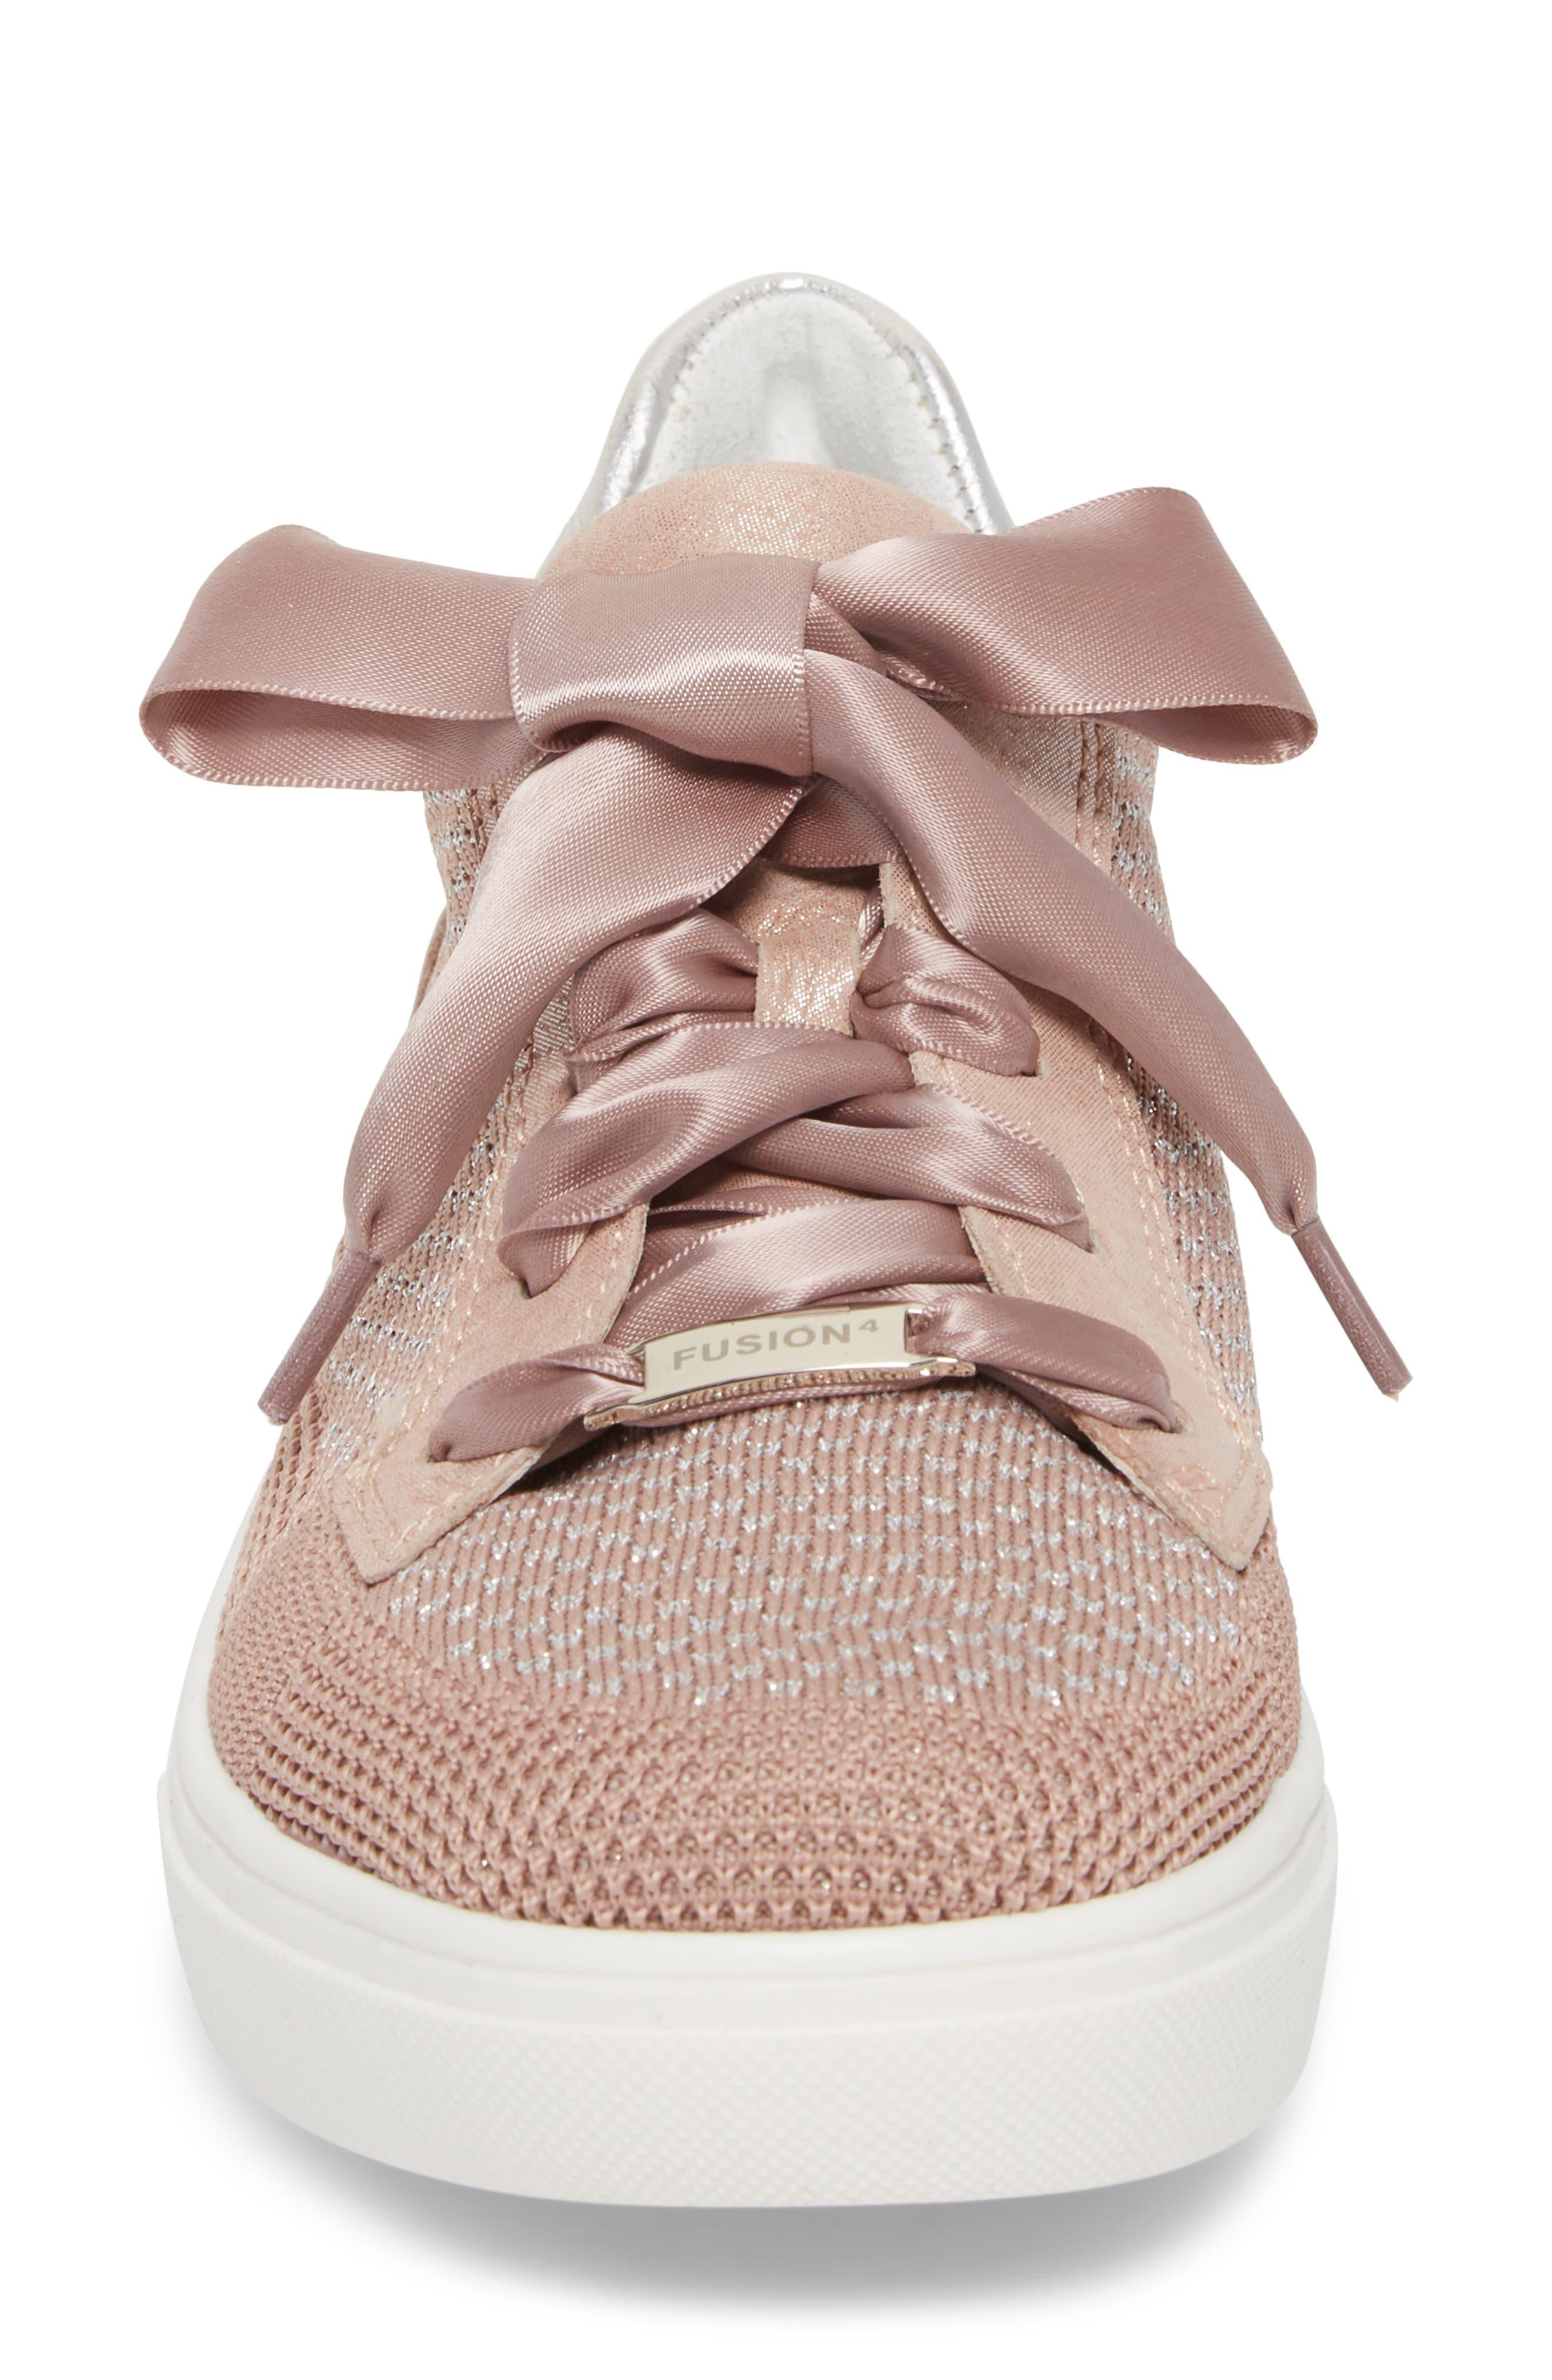 Natalya Sneaker,                             Alternate thumbnail 4, color,                             Powder Fabric